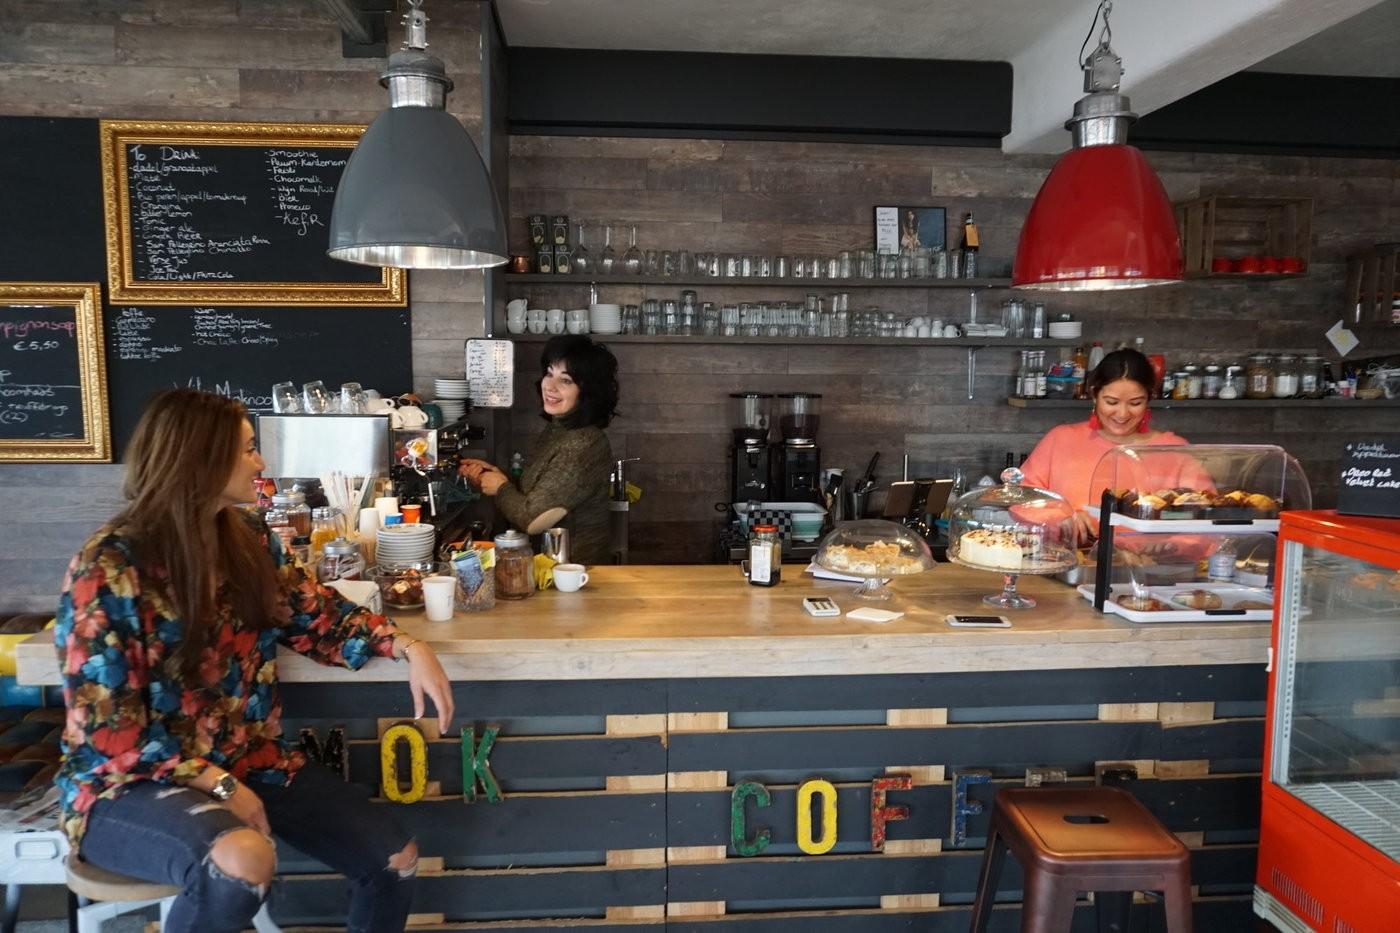 Medium cafe mok 10